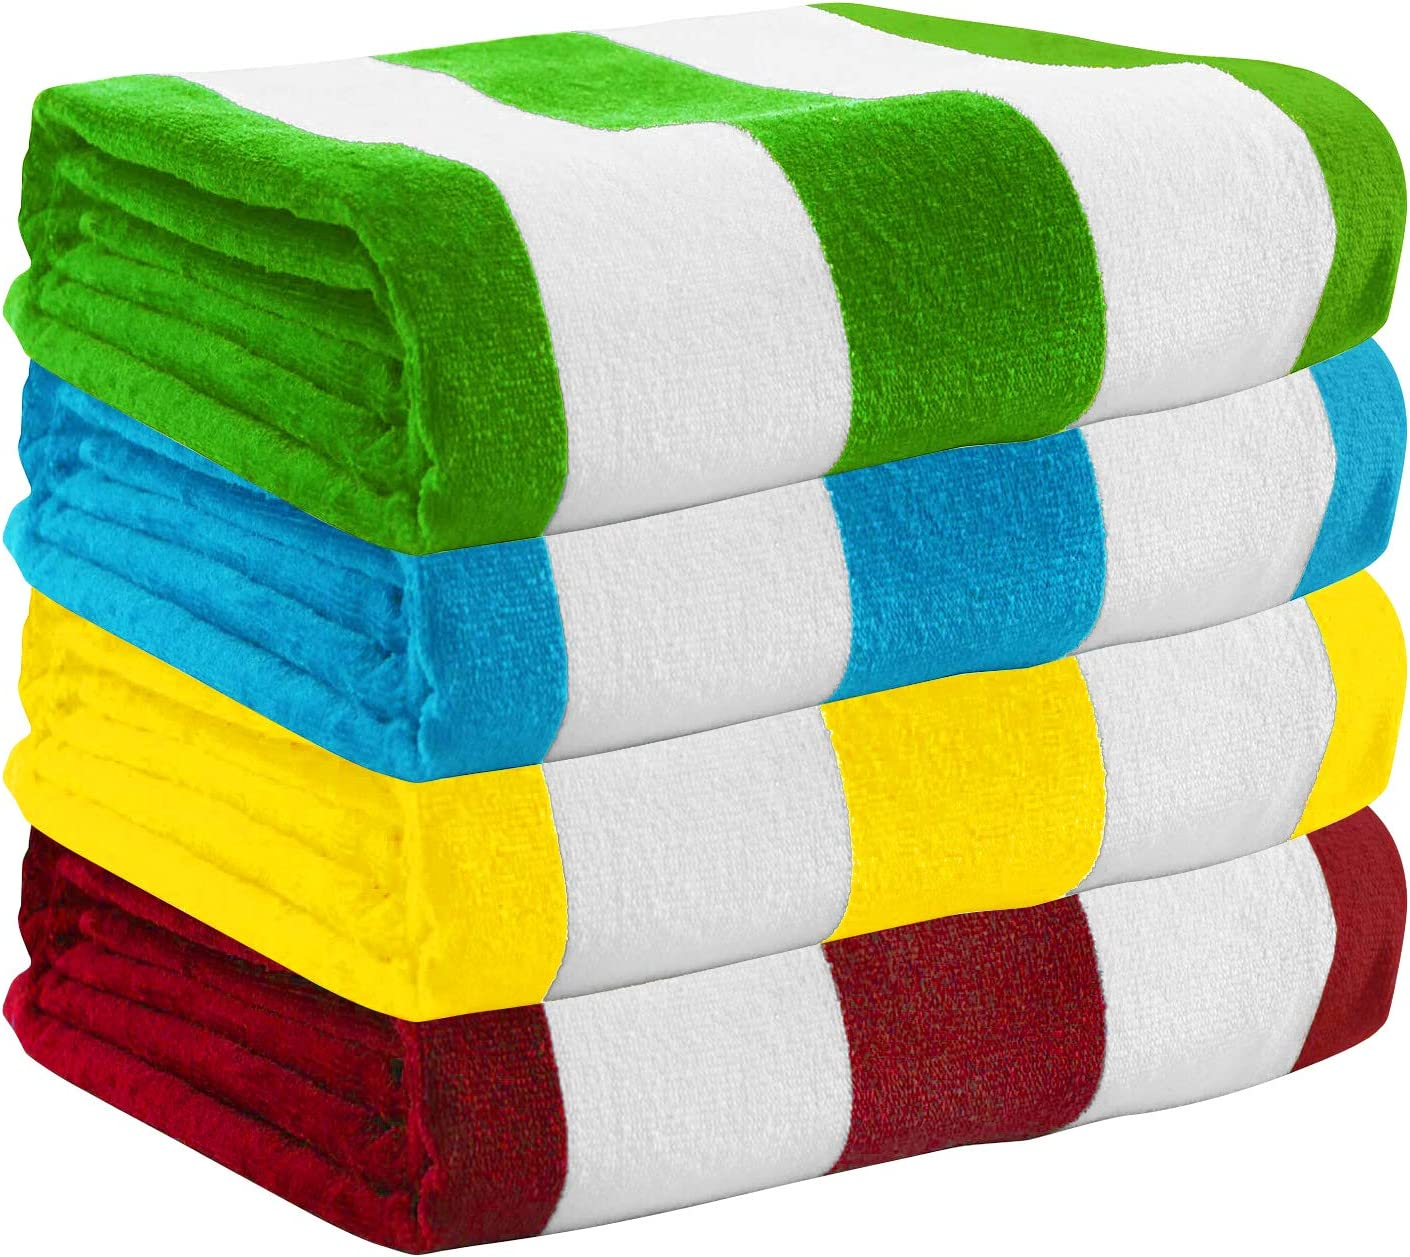 Exclusivo Mezcla 100% Cotton Oversized Large Beach Towel Sets